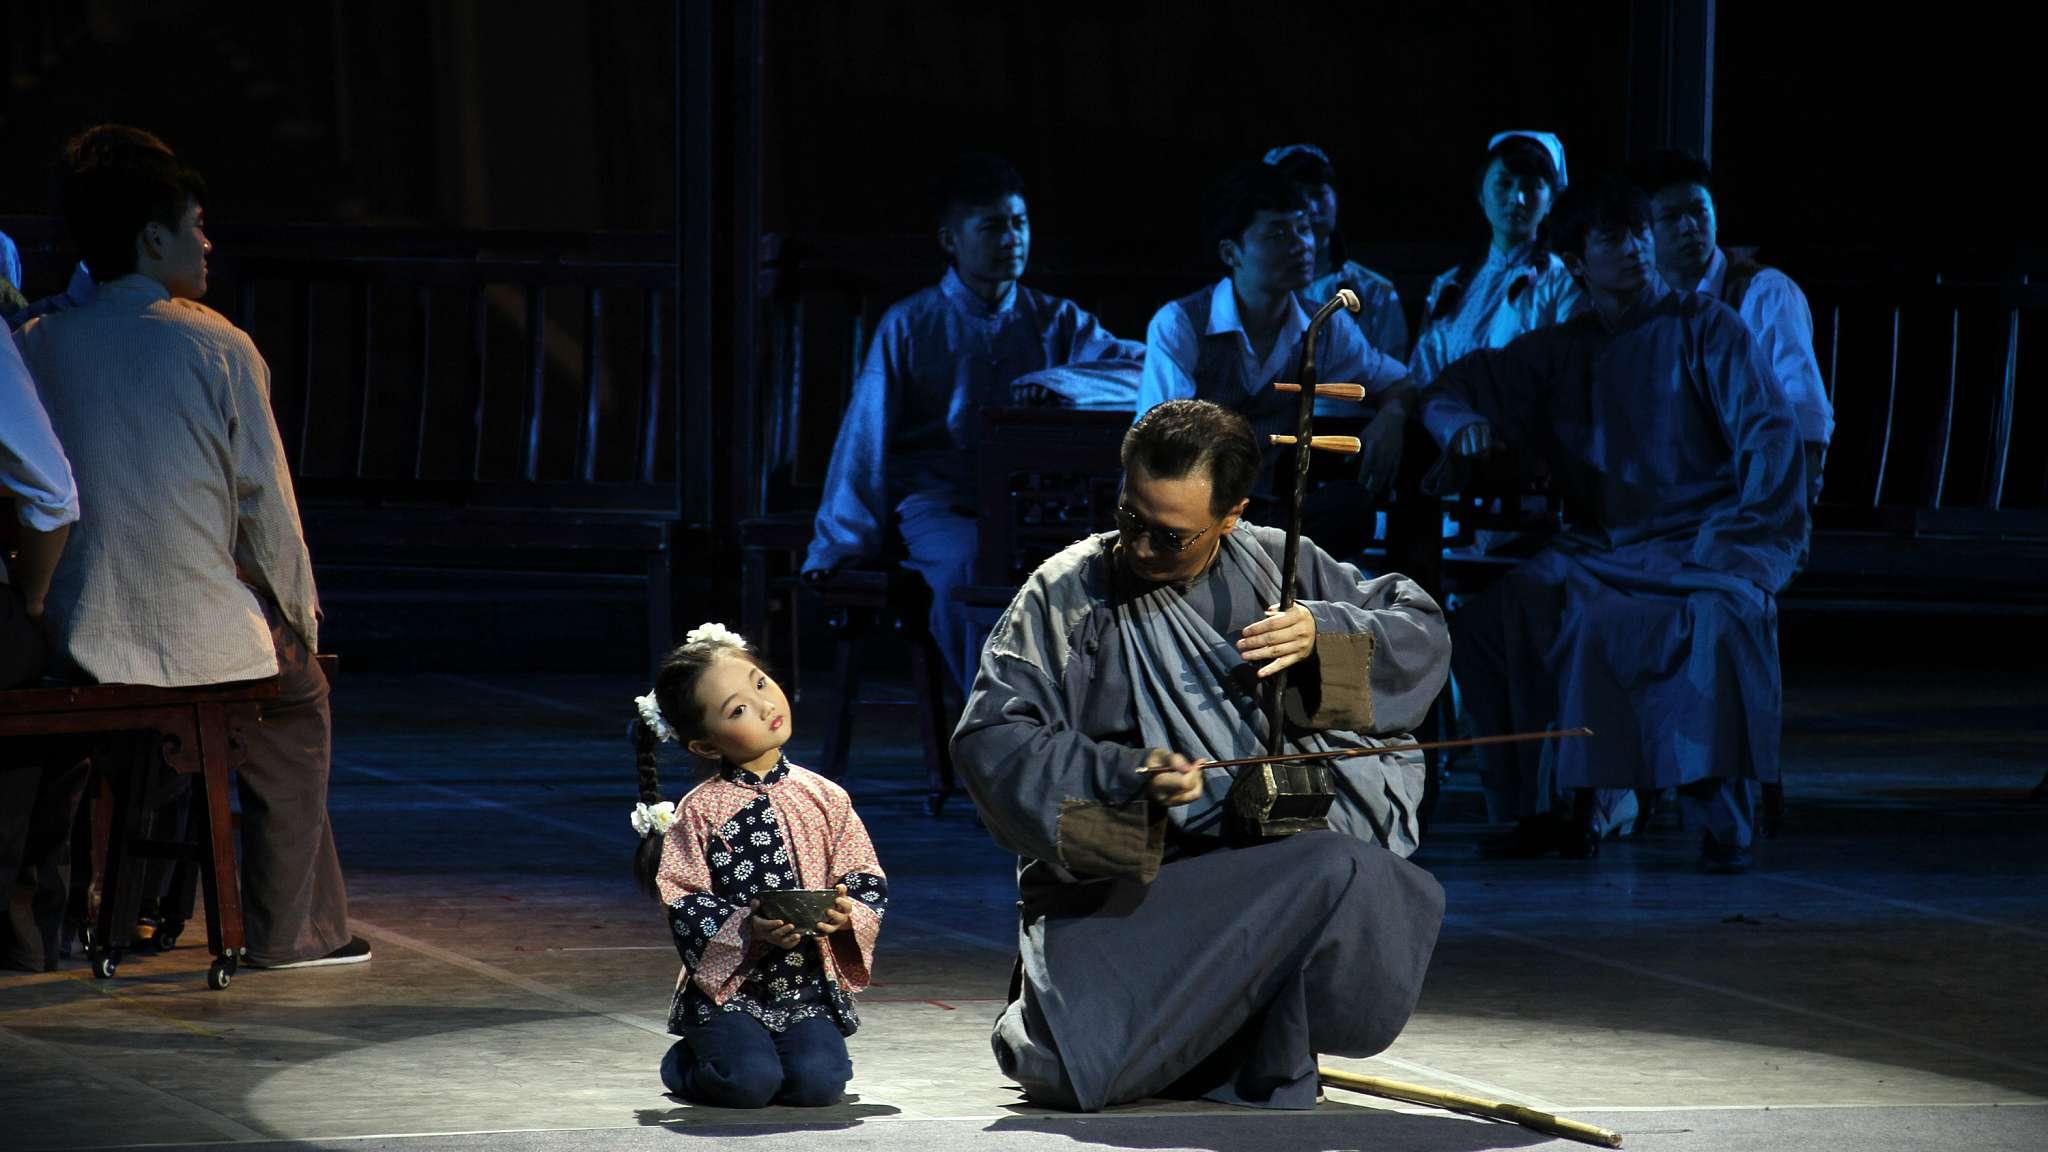 Hua Yanjun – A Chinese folk 'Beethoven'